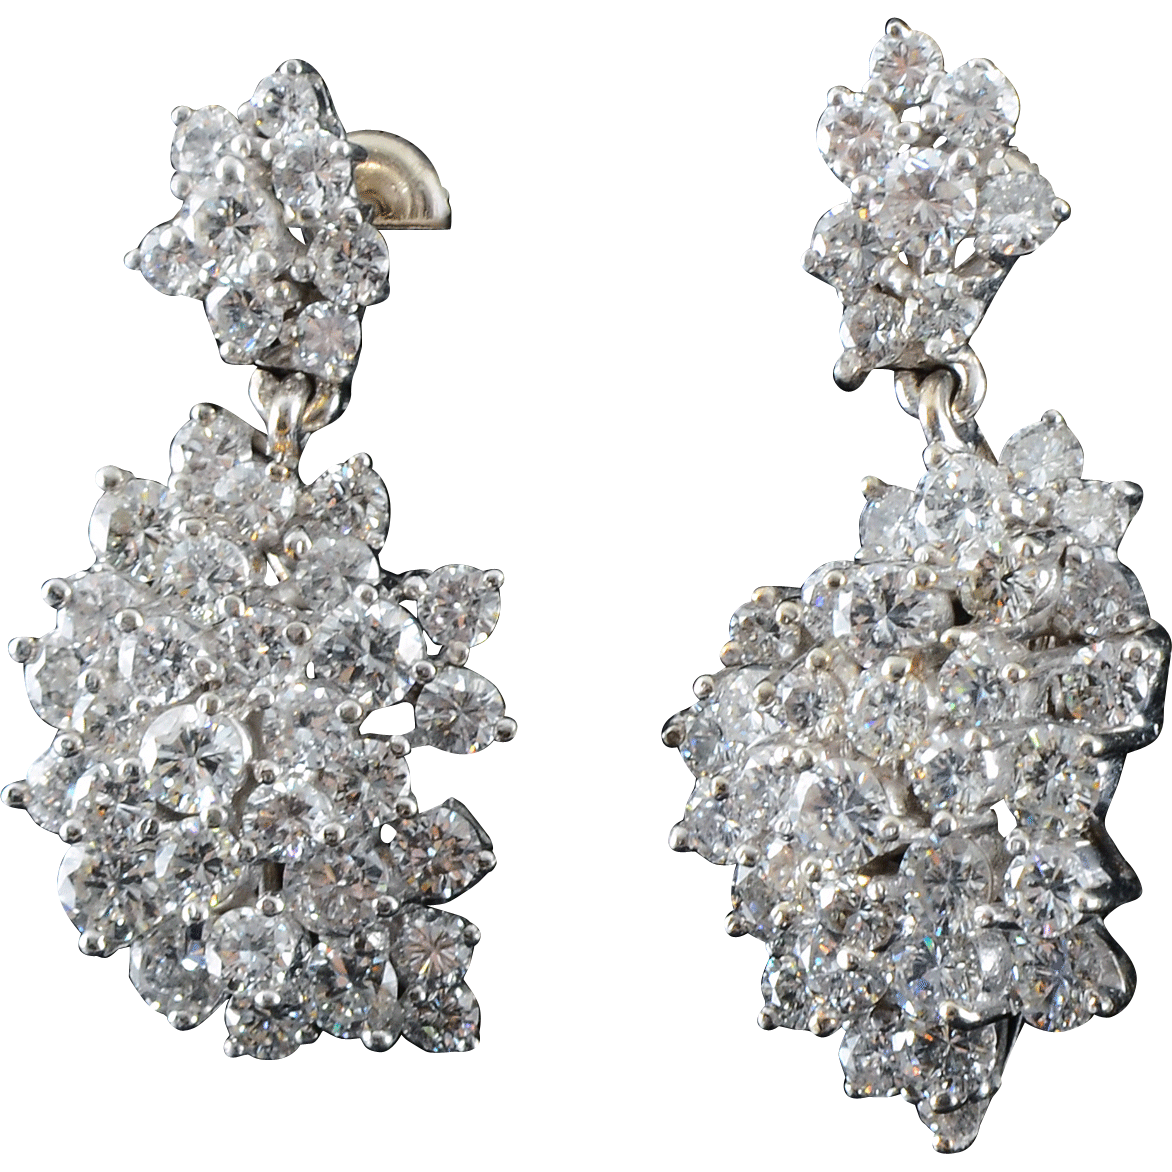 5.25 Carat Total Weight Diamond Drop Earrings